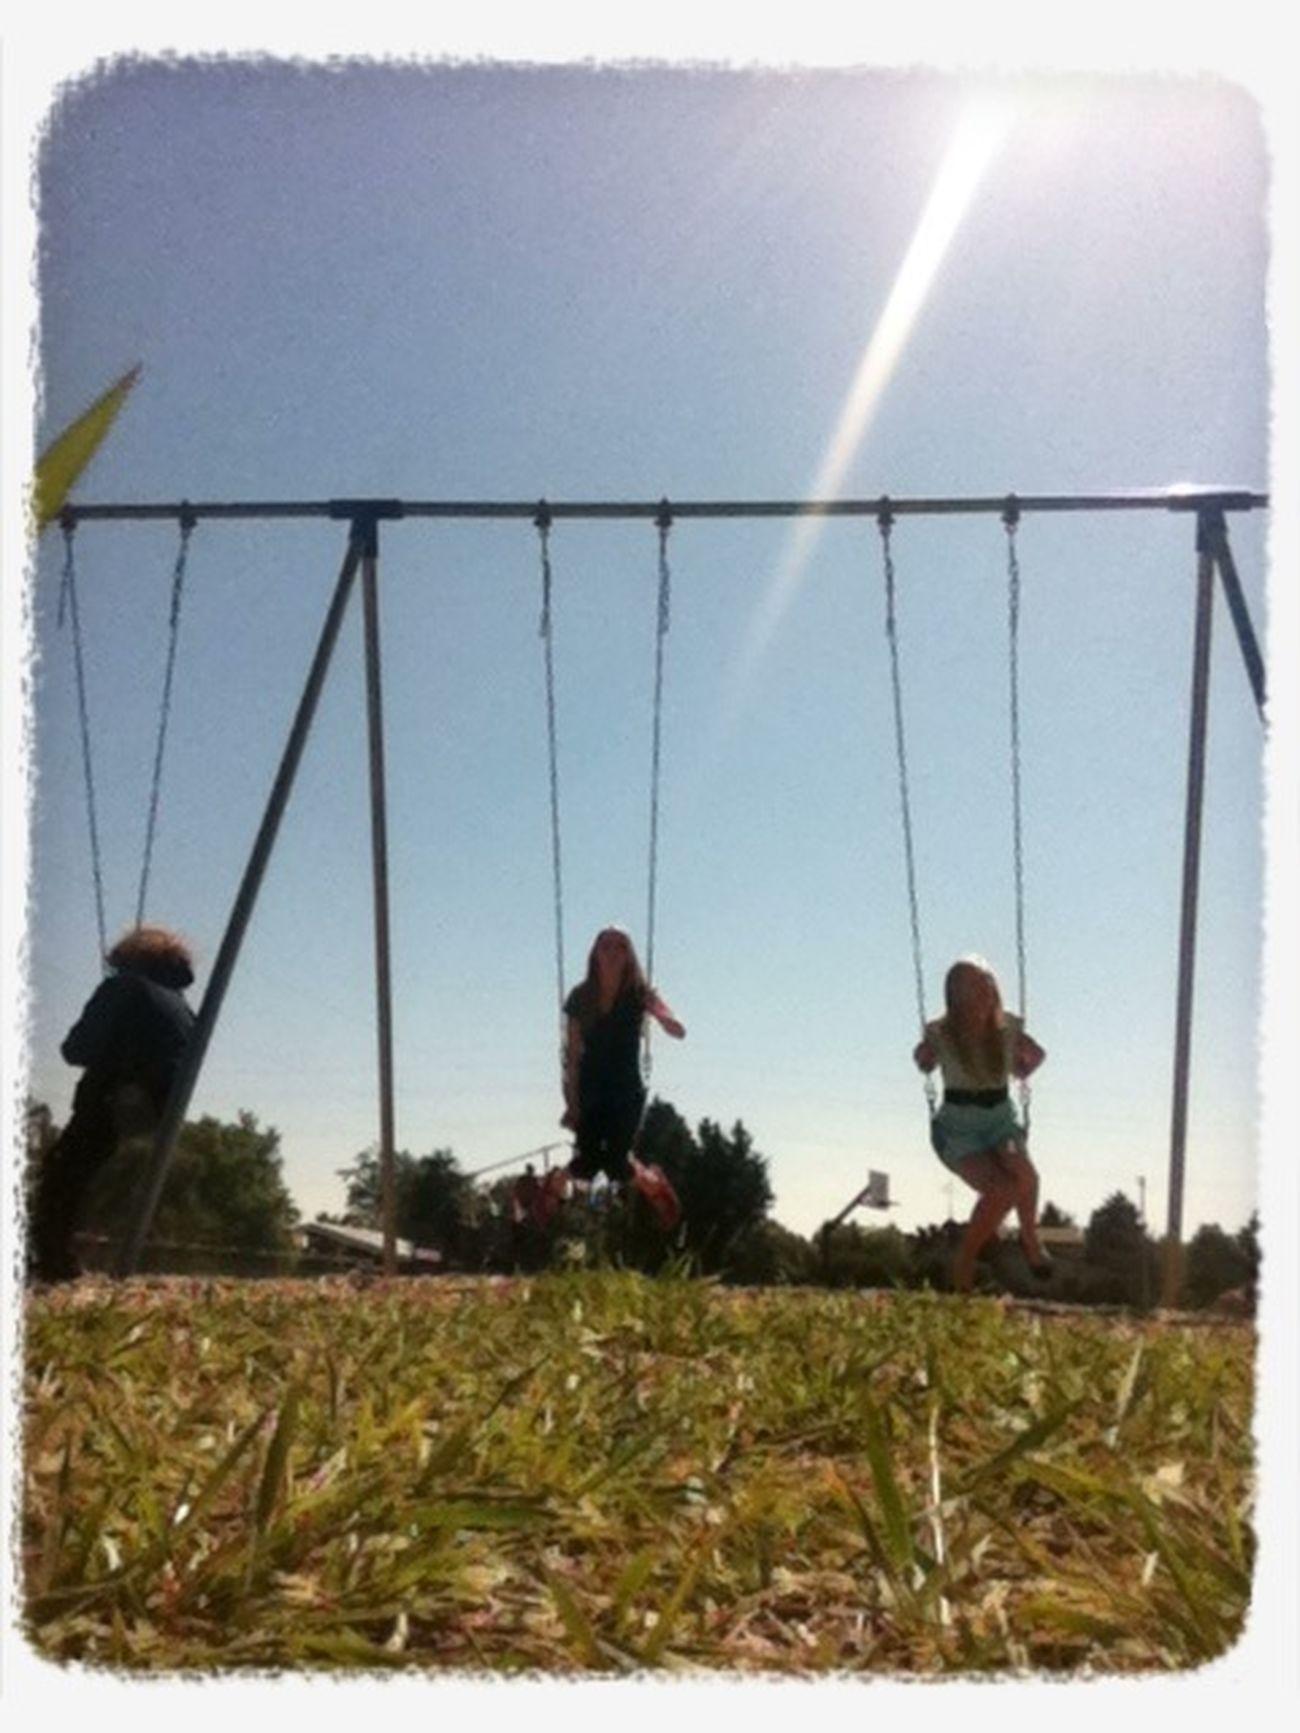 Chillin' on the swings